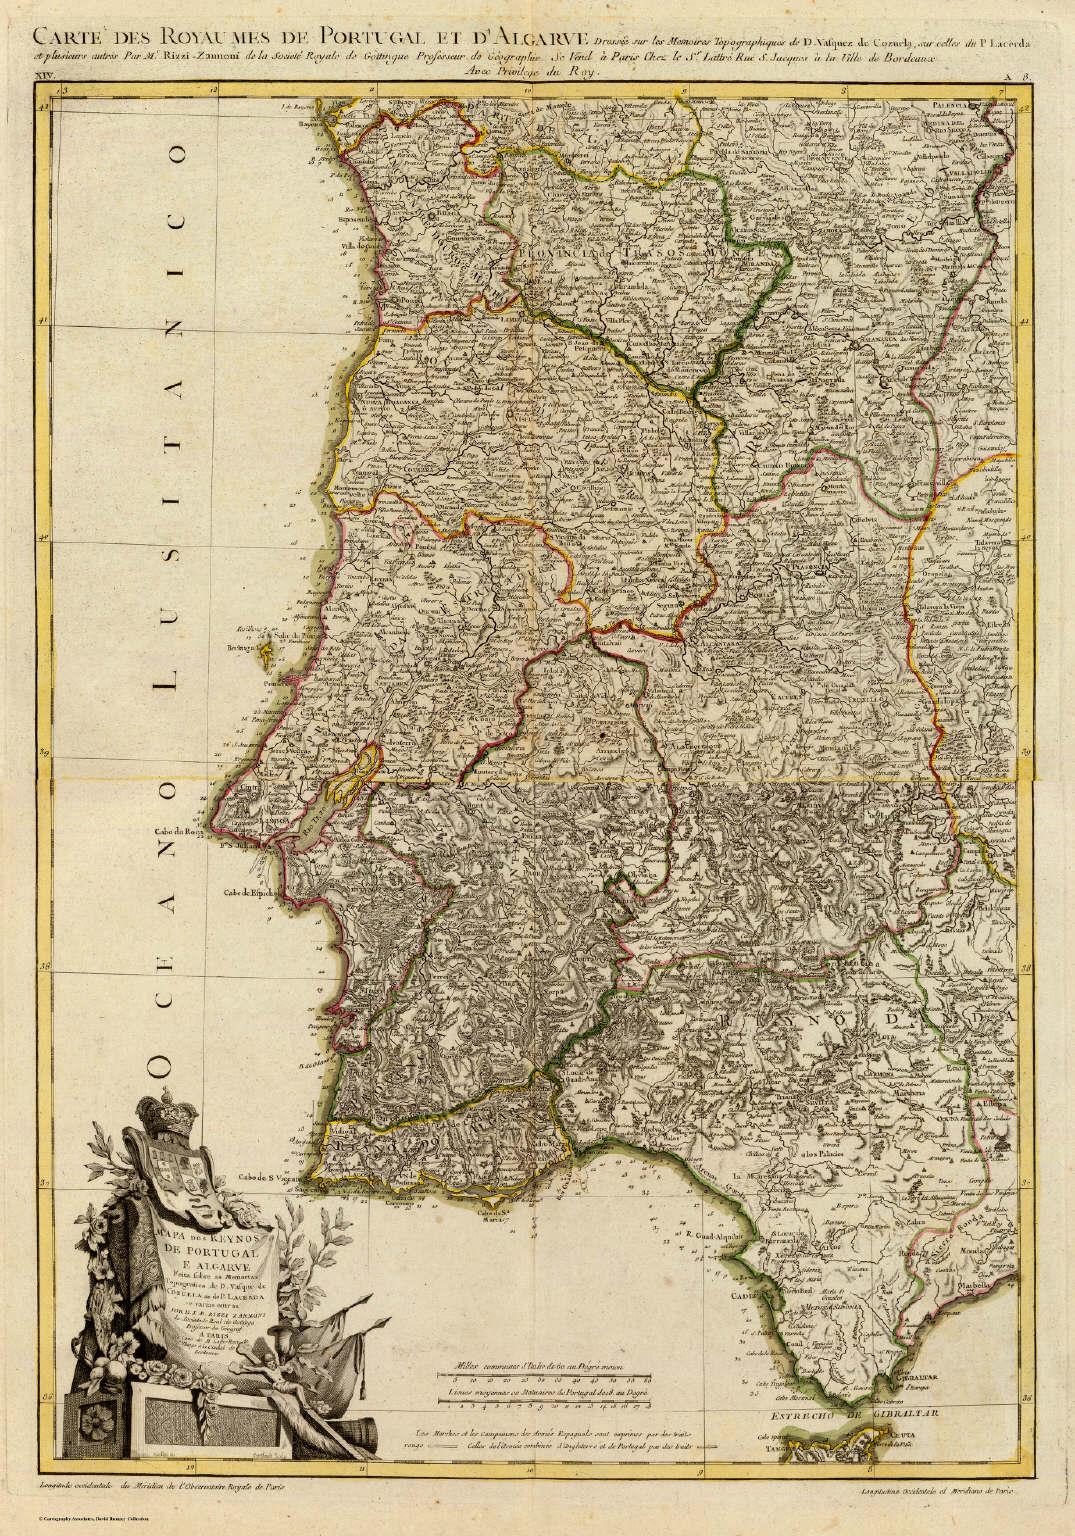 mapa historico de portugal Composite: Portugal, Algarve.   David Rumsey Historical Map Collection mapa historico de portugal